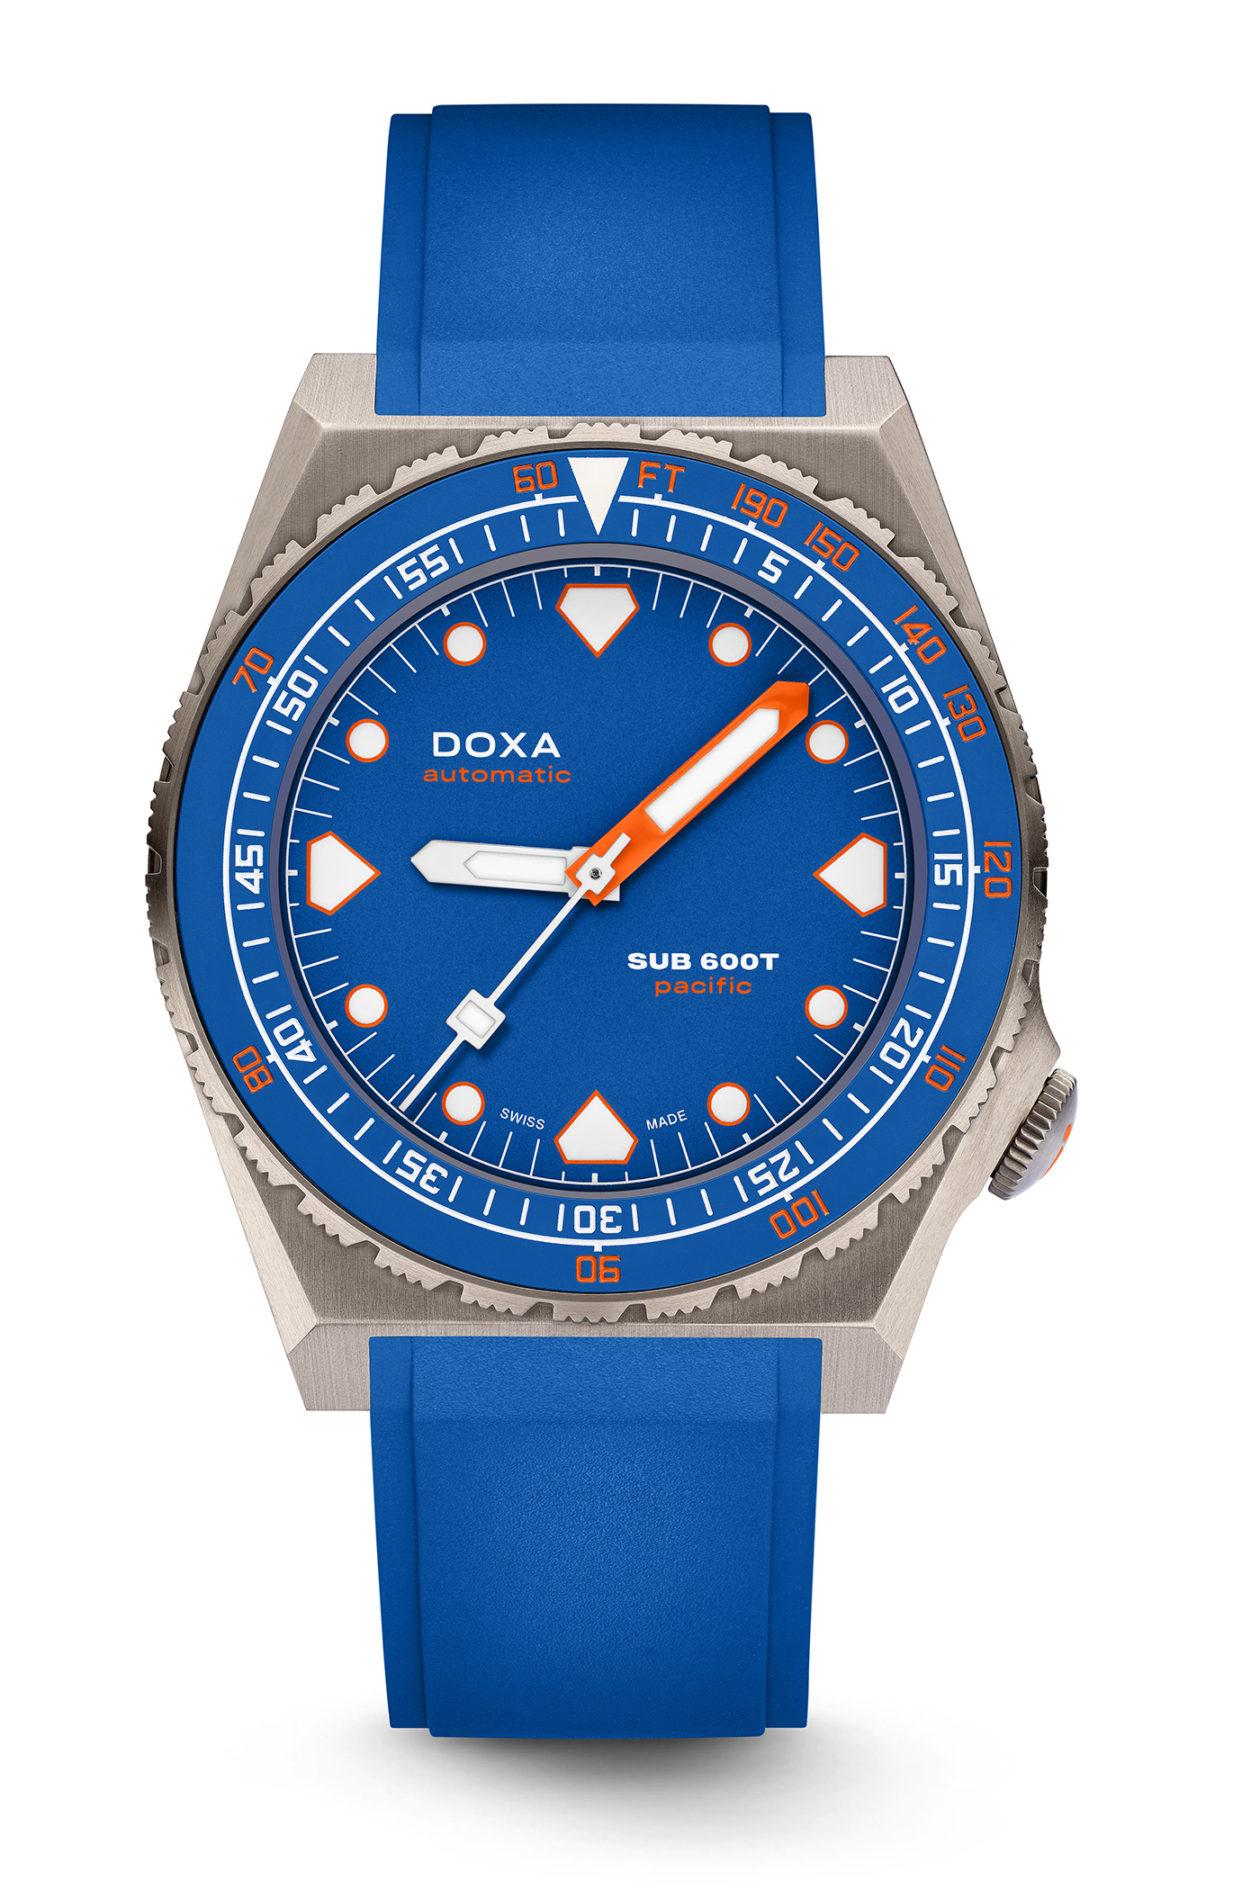 "Doxa SUB 600T ""pacific"""